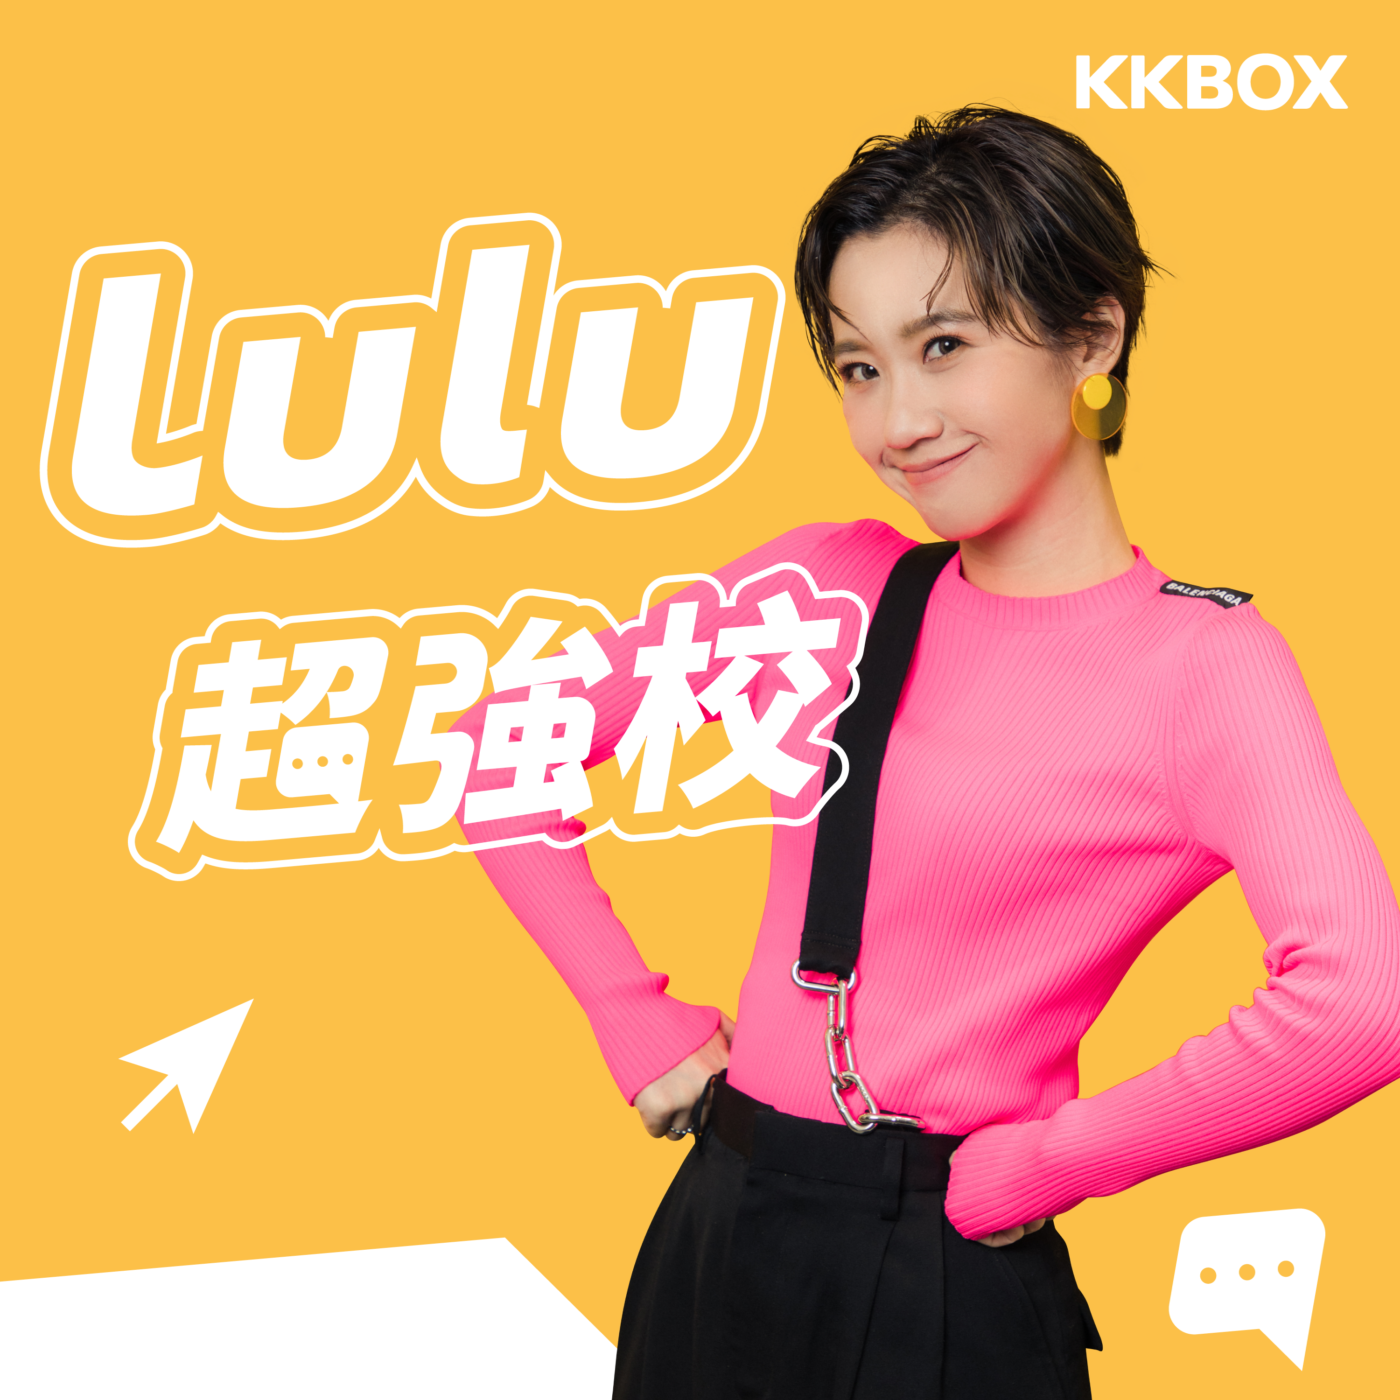 Lulu超強校(完整版)